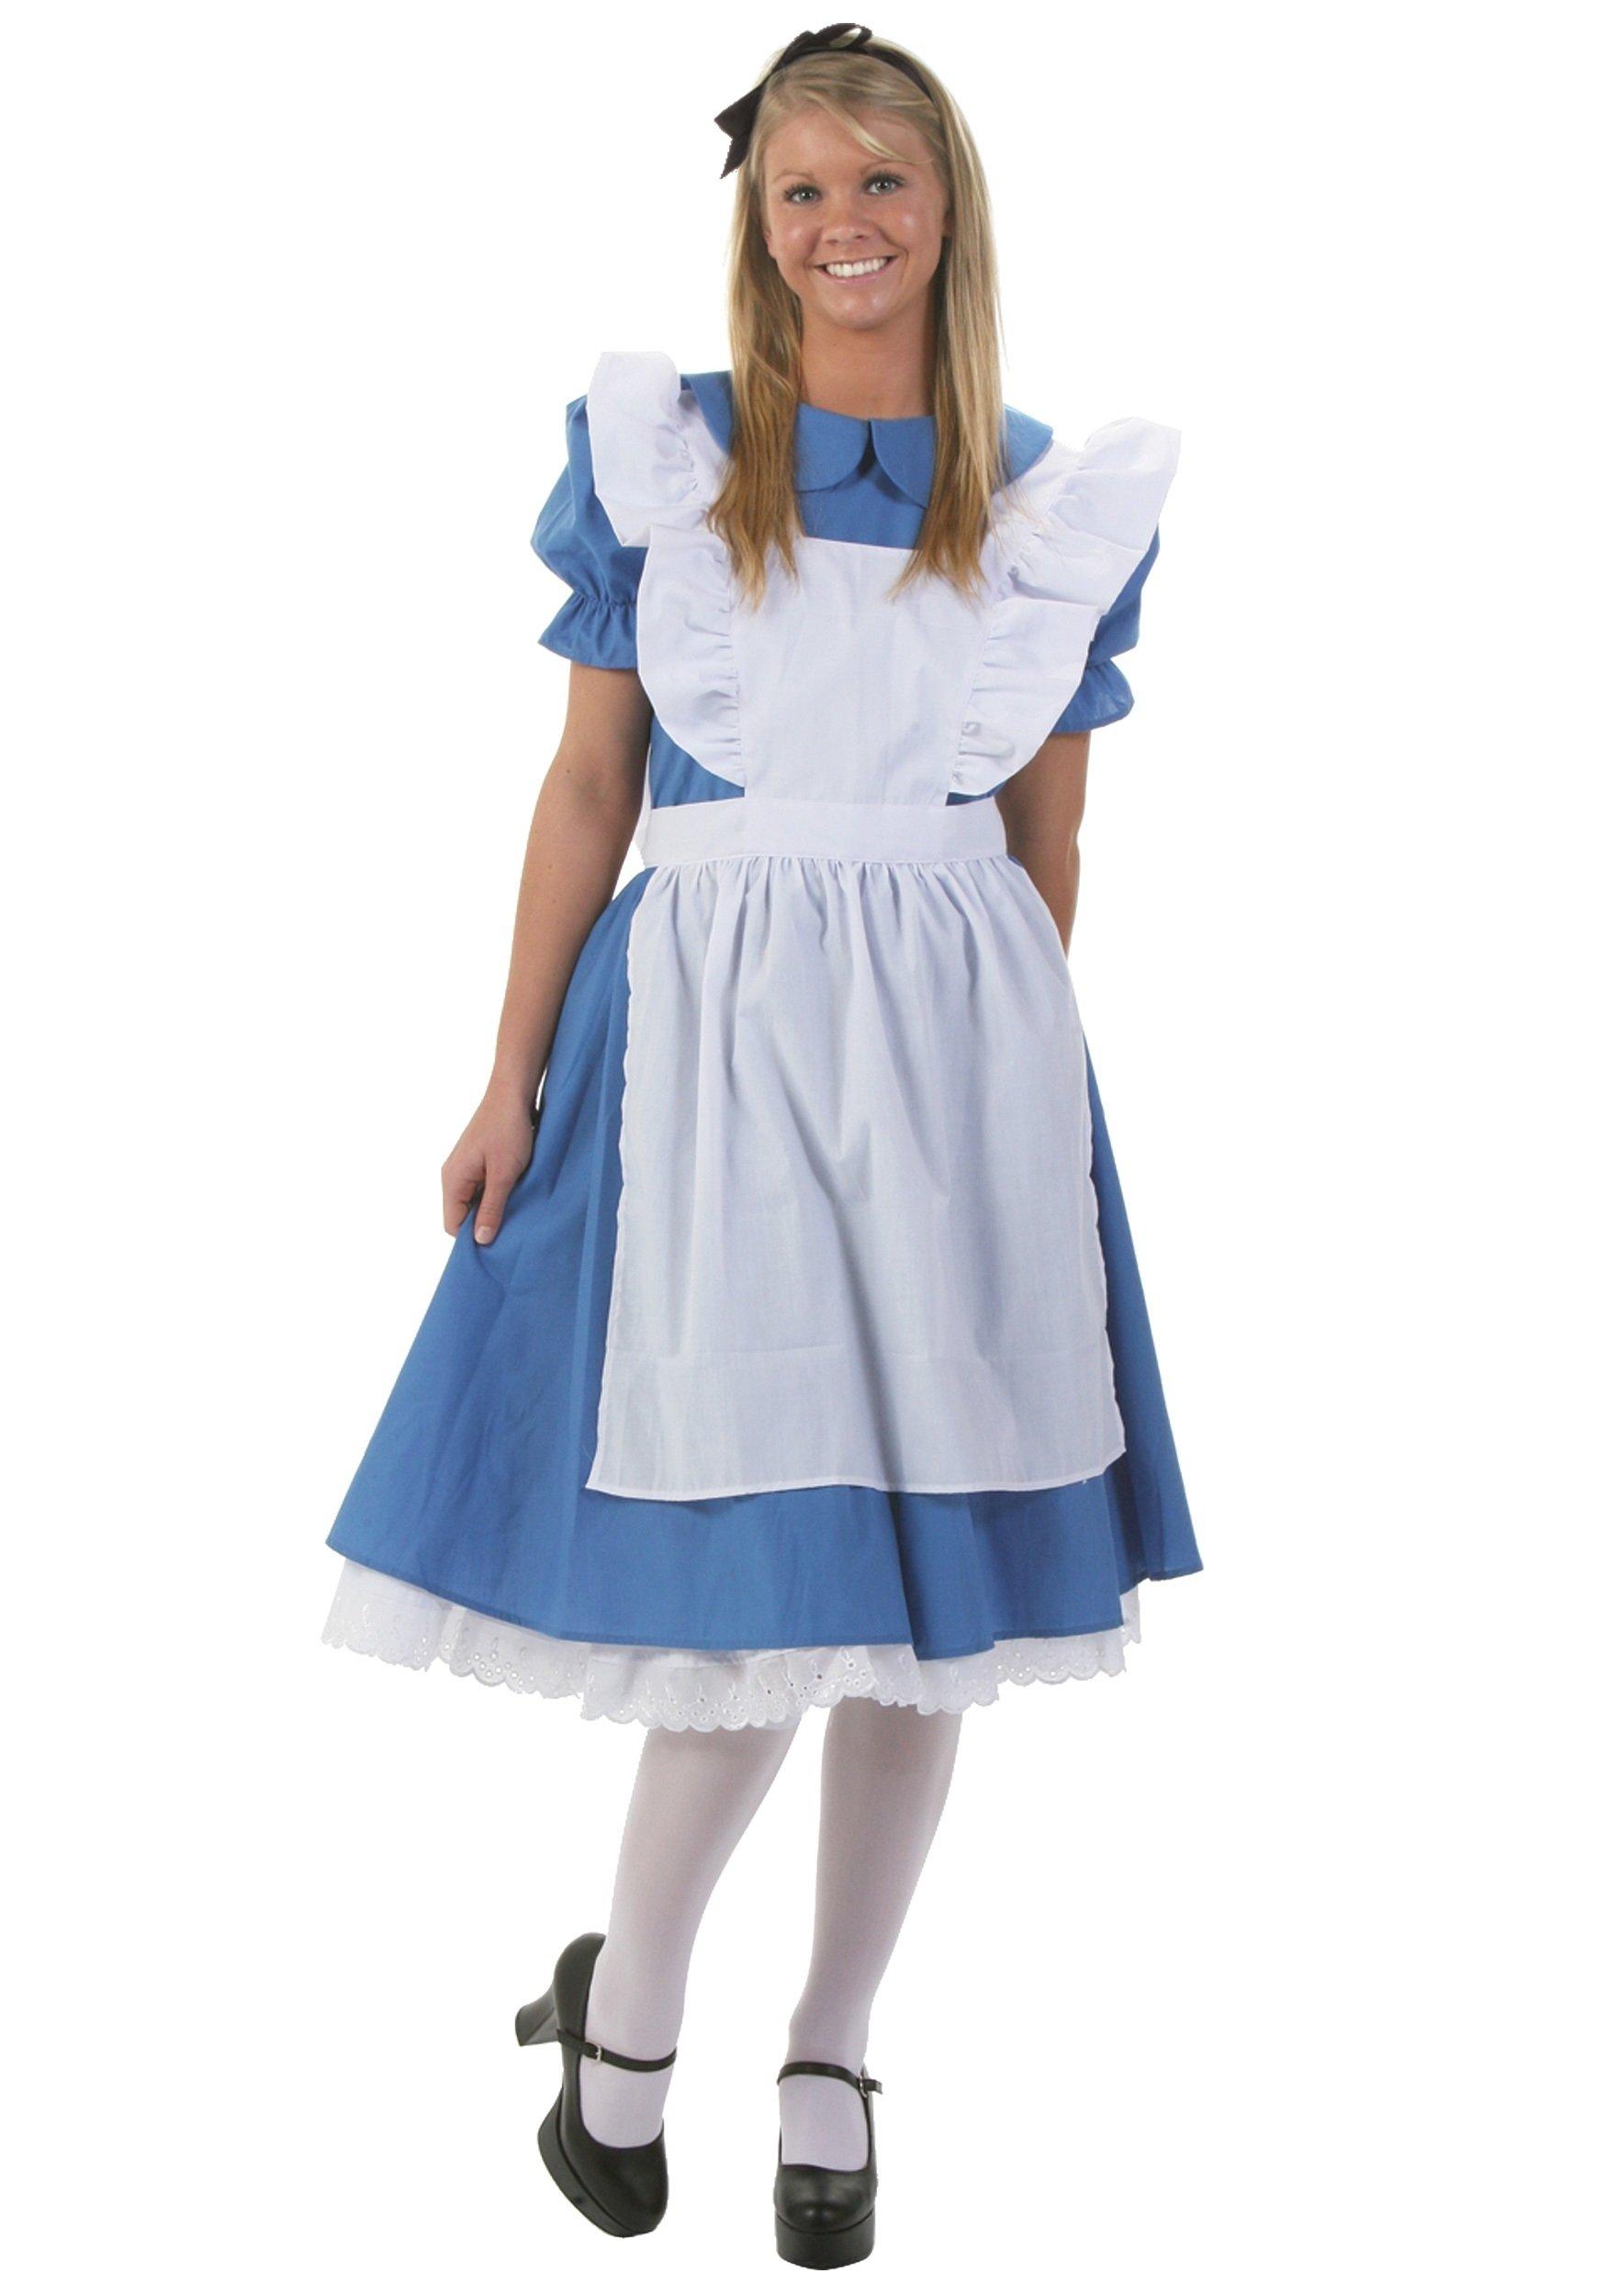 10 Gorgeous Alice And Wonderland Costume Ideas adult alice costume womens alice in wonderland costume dress 2020